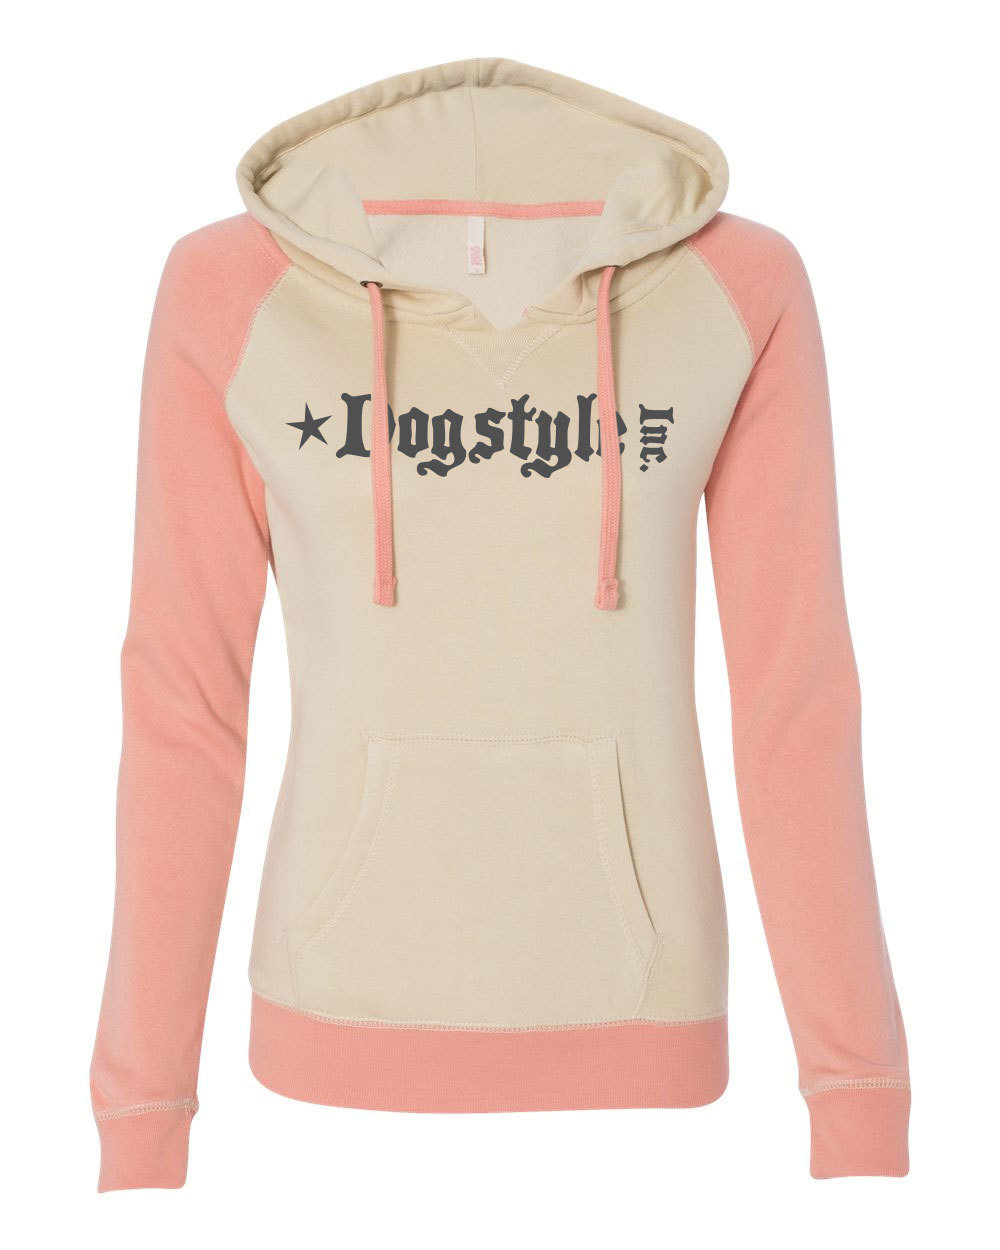 Ladies Pullover Sweatshirt - Sand/ Orangeade 00089